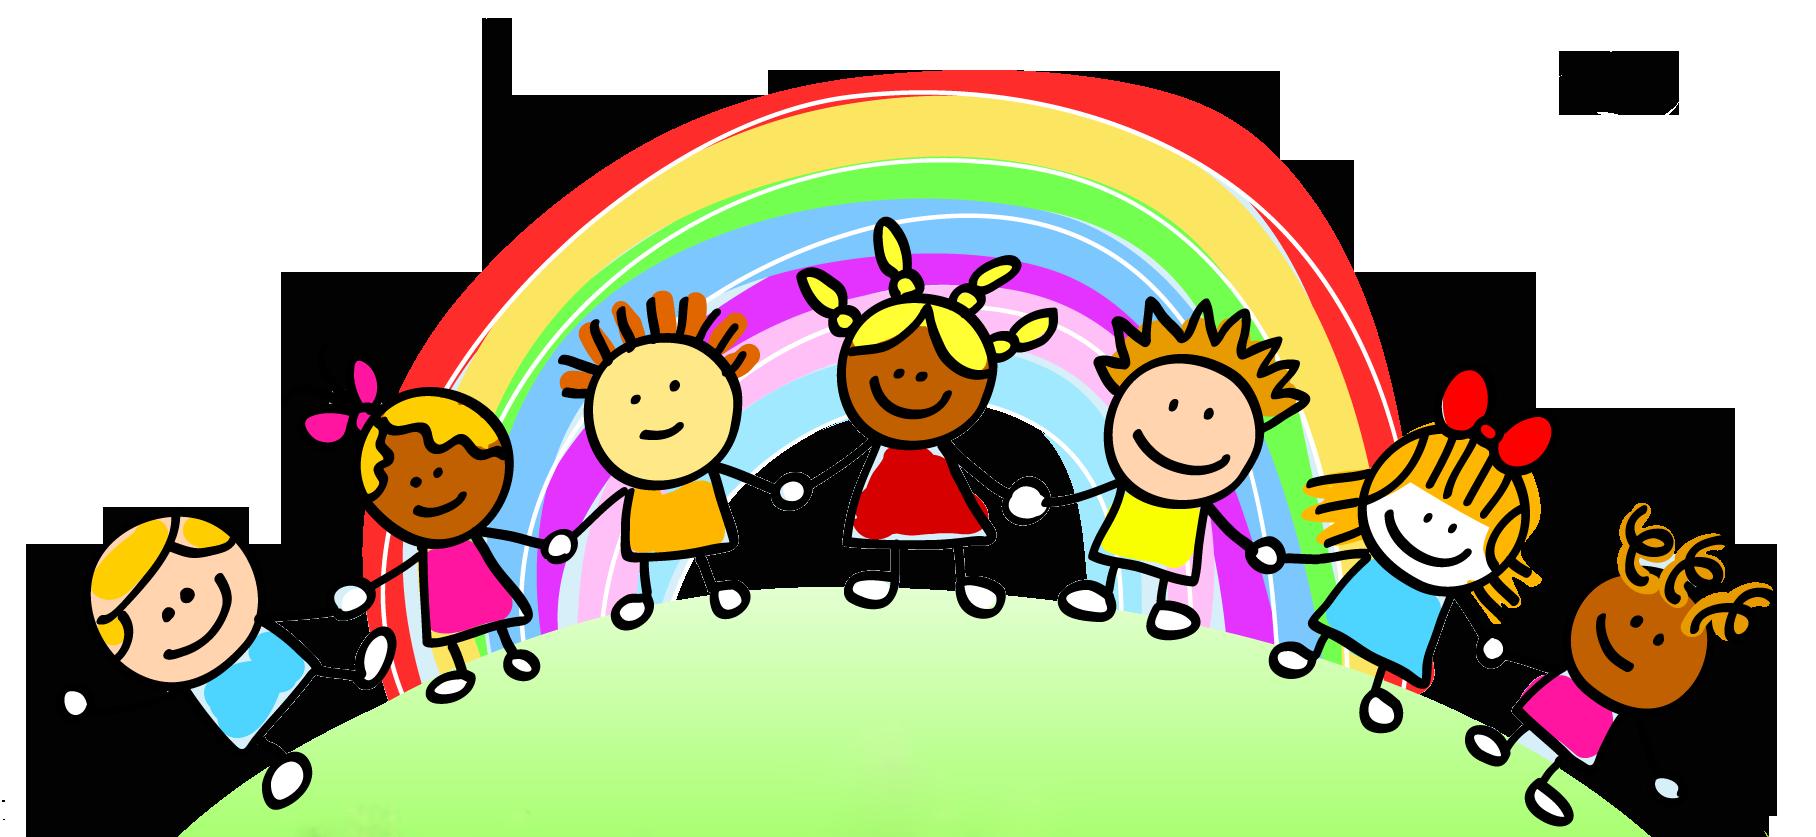 Landscape clipart kindergarten student. Rainbow jokingart com children